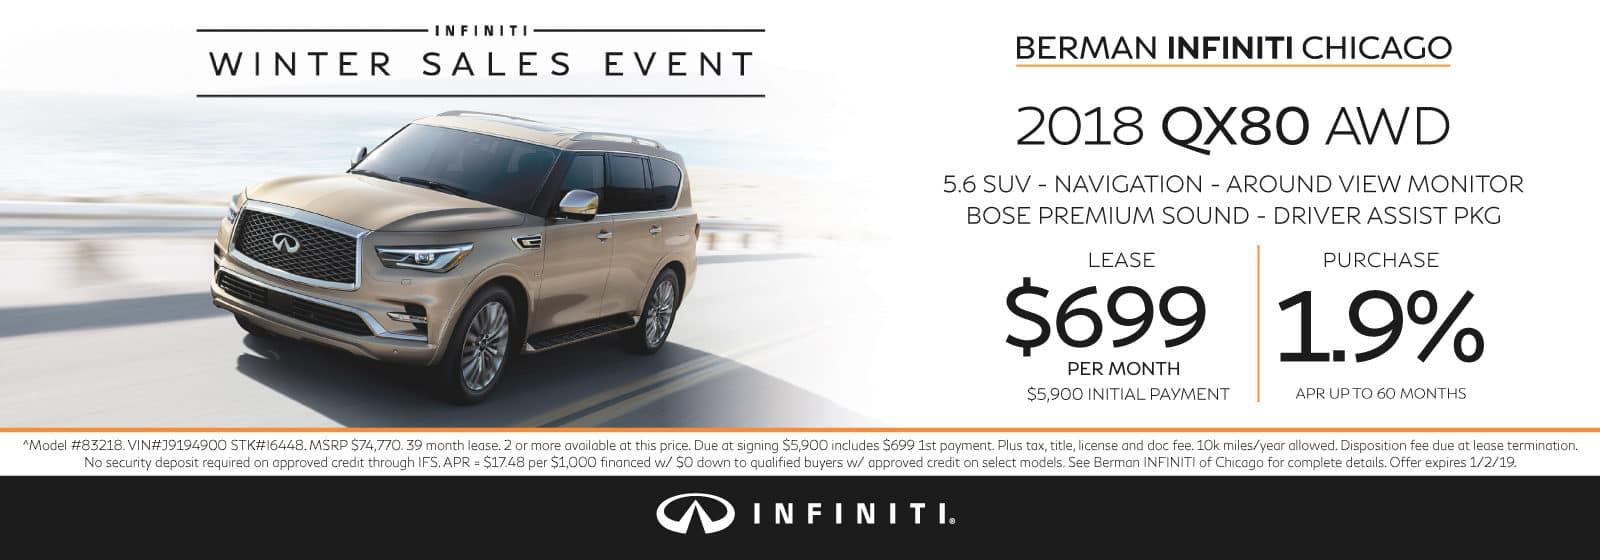 New 2018 INFINITI QX80 December offer at Berman INFINITI Chicago!